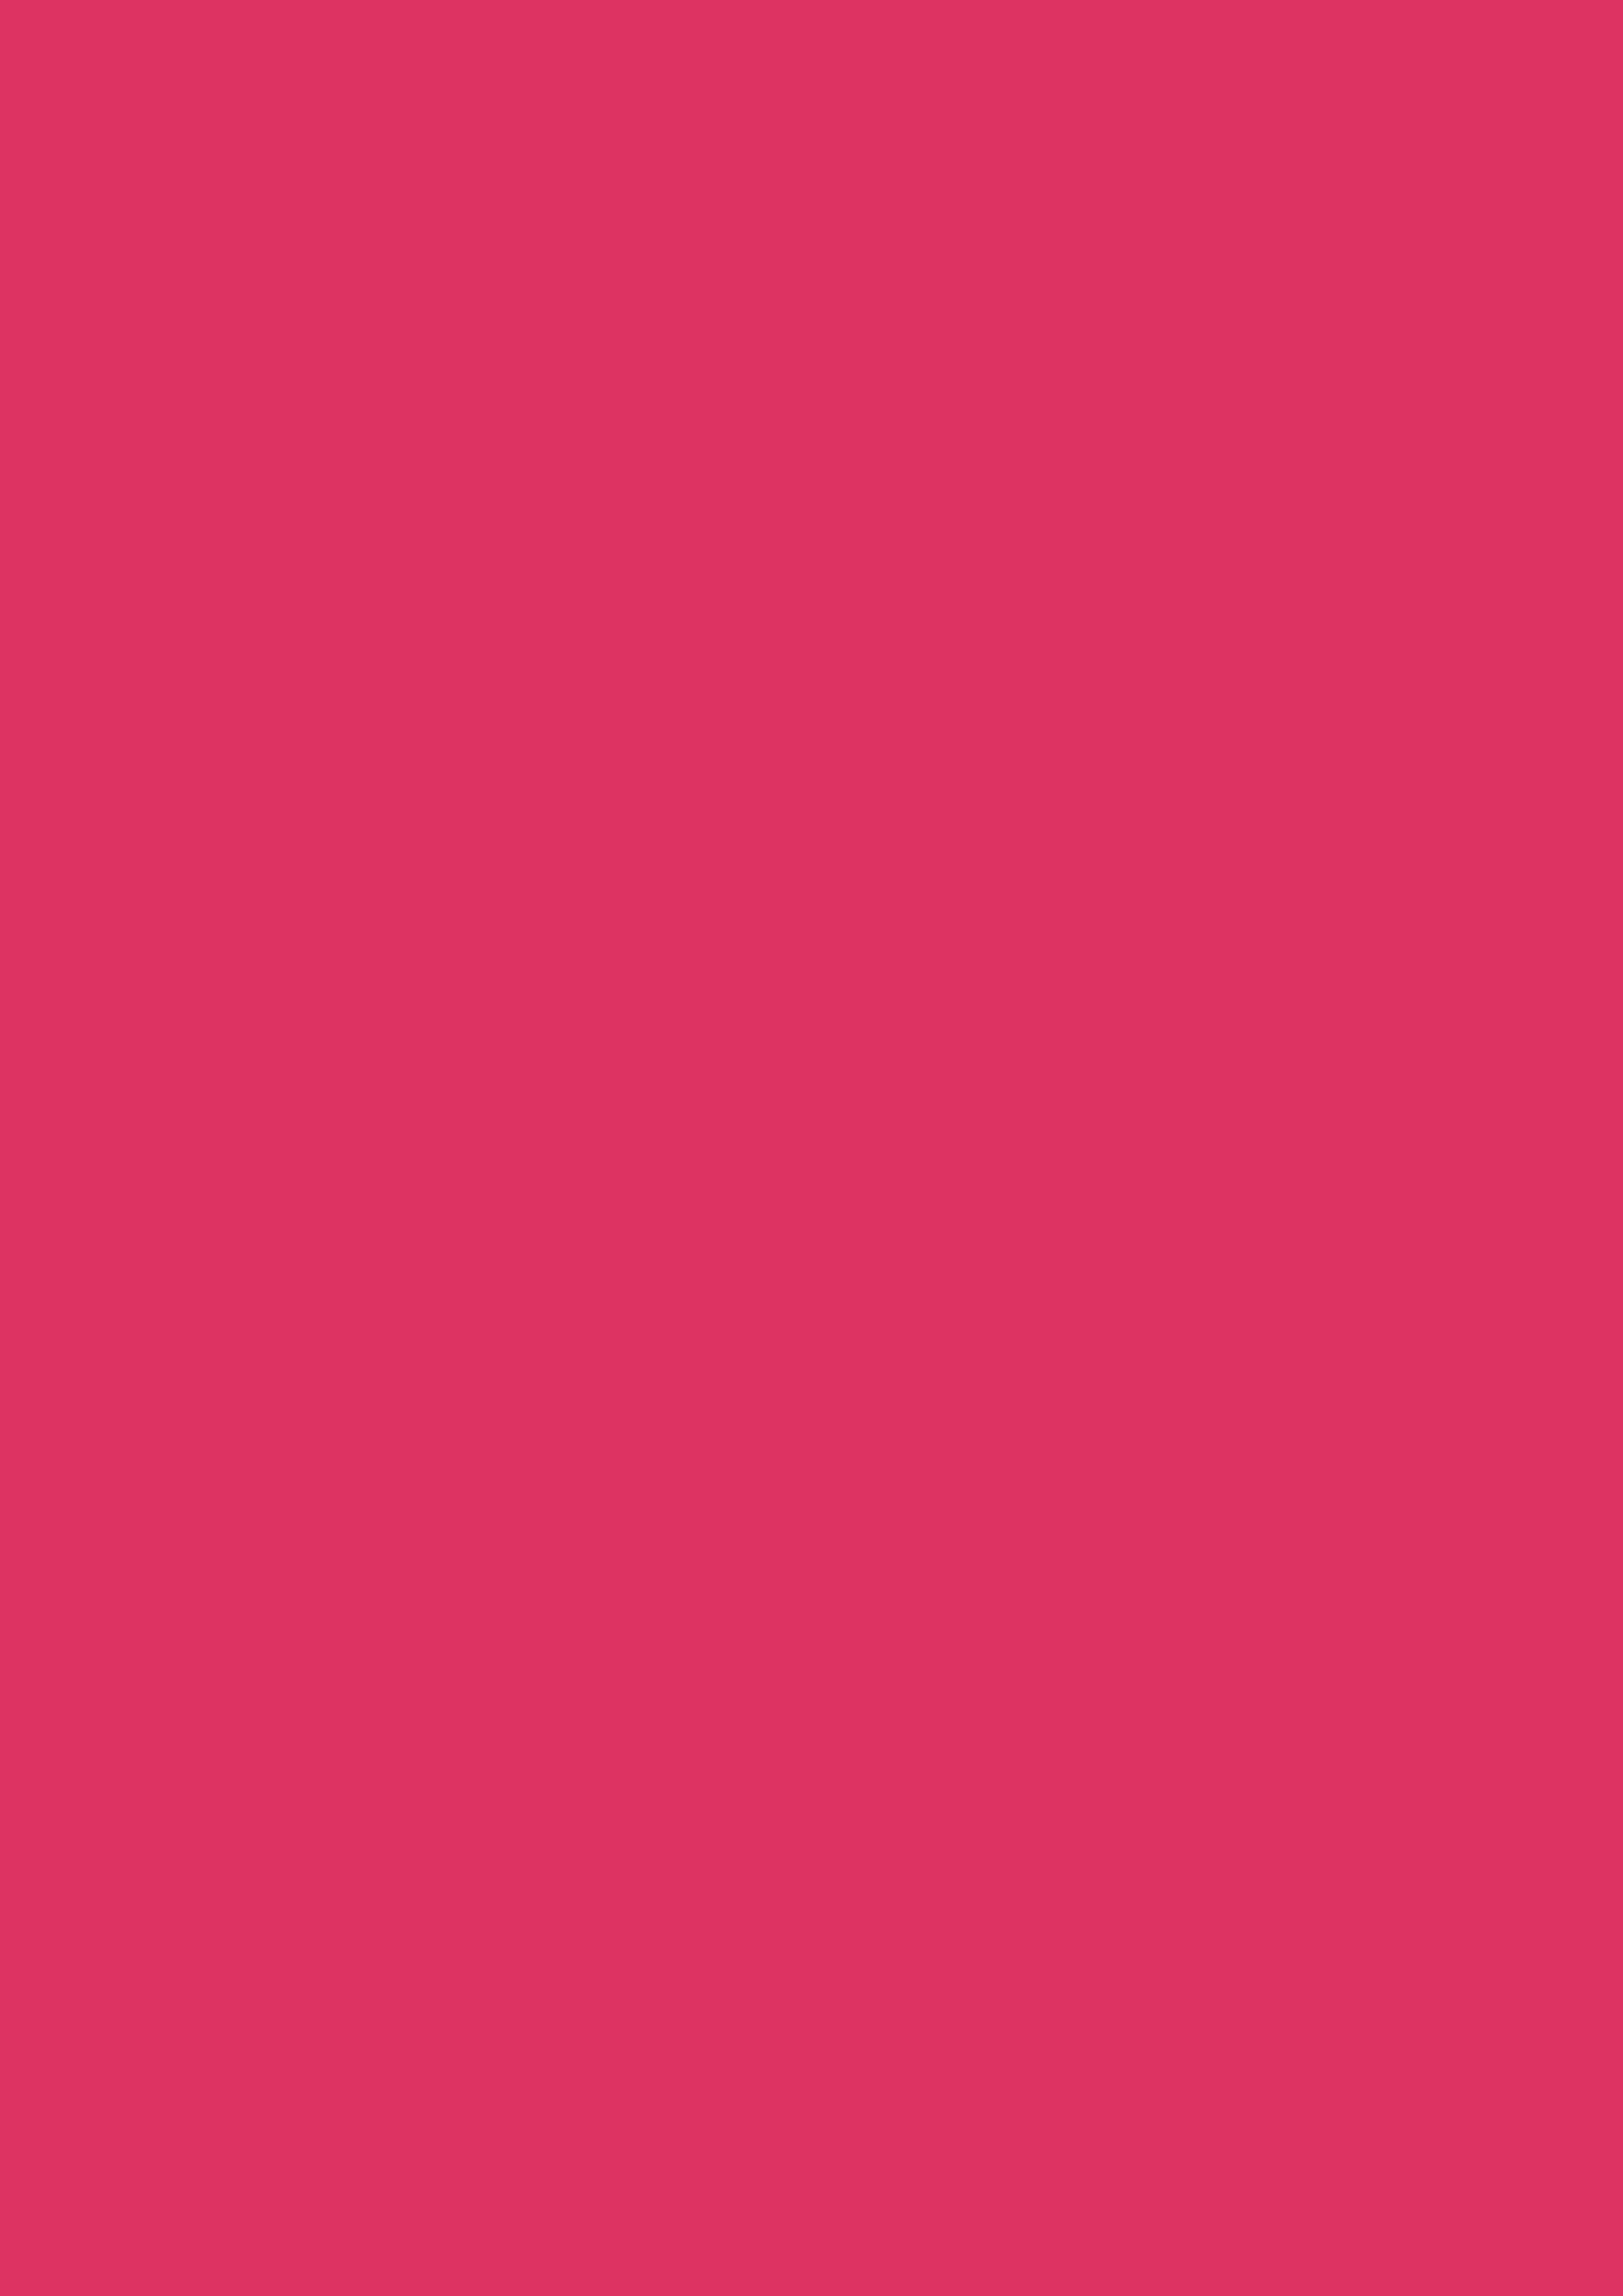 2480x3508 Cerise Solid Color Background